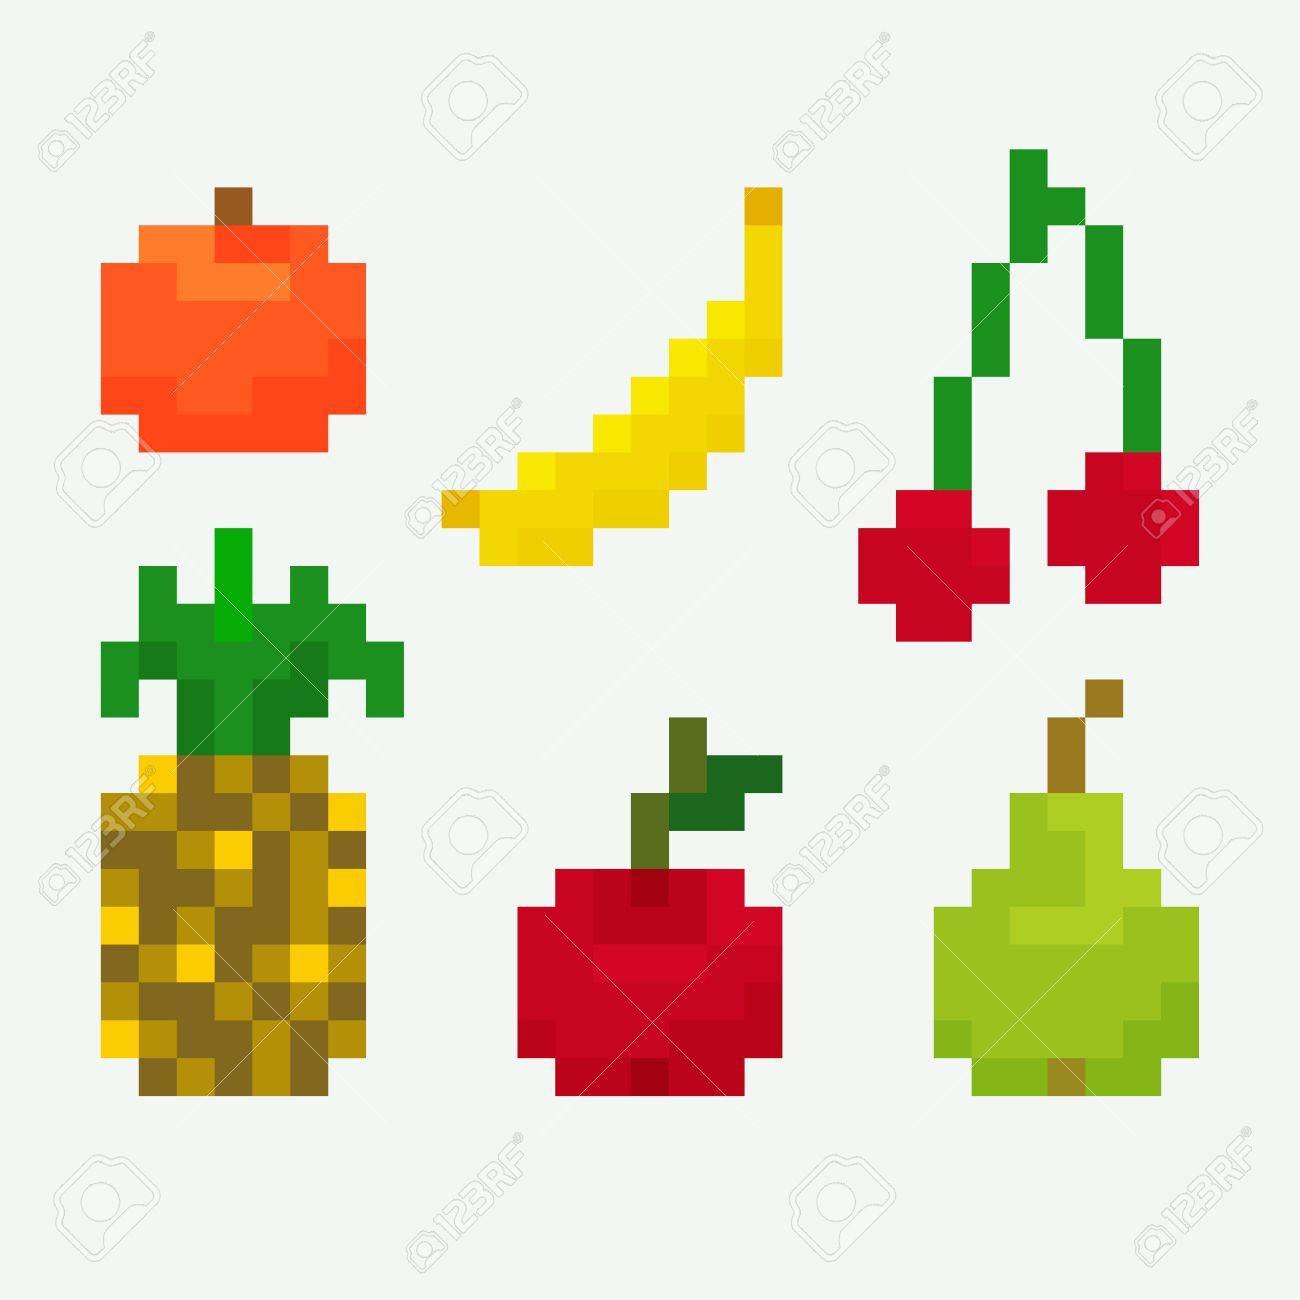 Set Of Pixel Art Icons For Fruits Orange Banana Cherry Pineapple